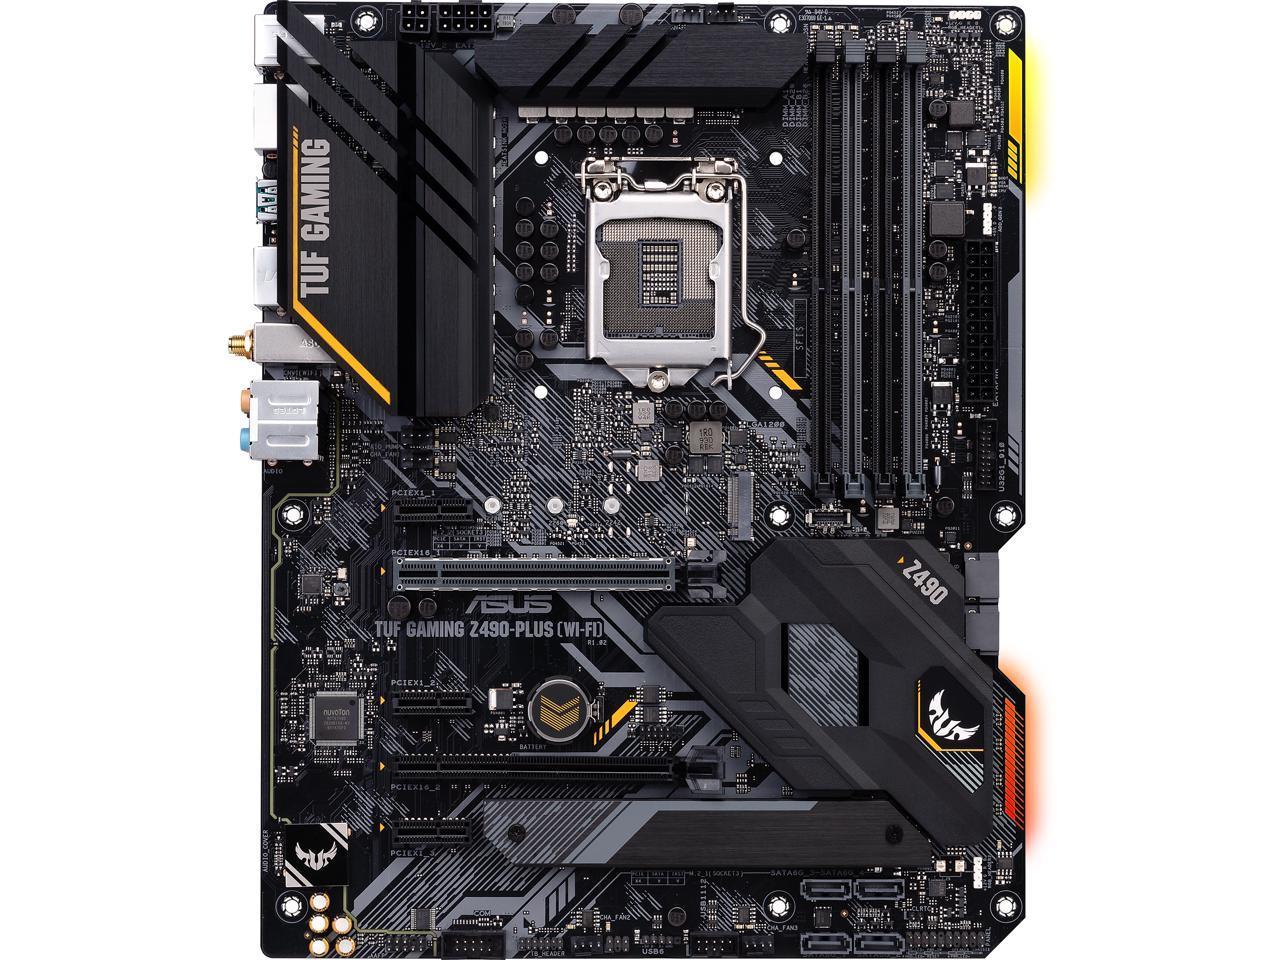 Intel 10th Gen ATX Motherboard 12+2 Power Stages, USB 3.2 Front Panel Type-C, 1Gb LAN, Addressable Gen 2 RGB Header /& Aura Sync ASUS TUF Gaming Z490-Plus LGA 1200